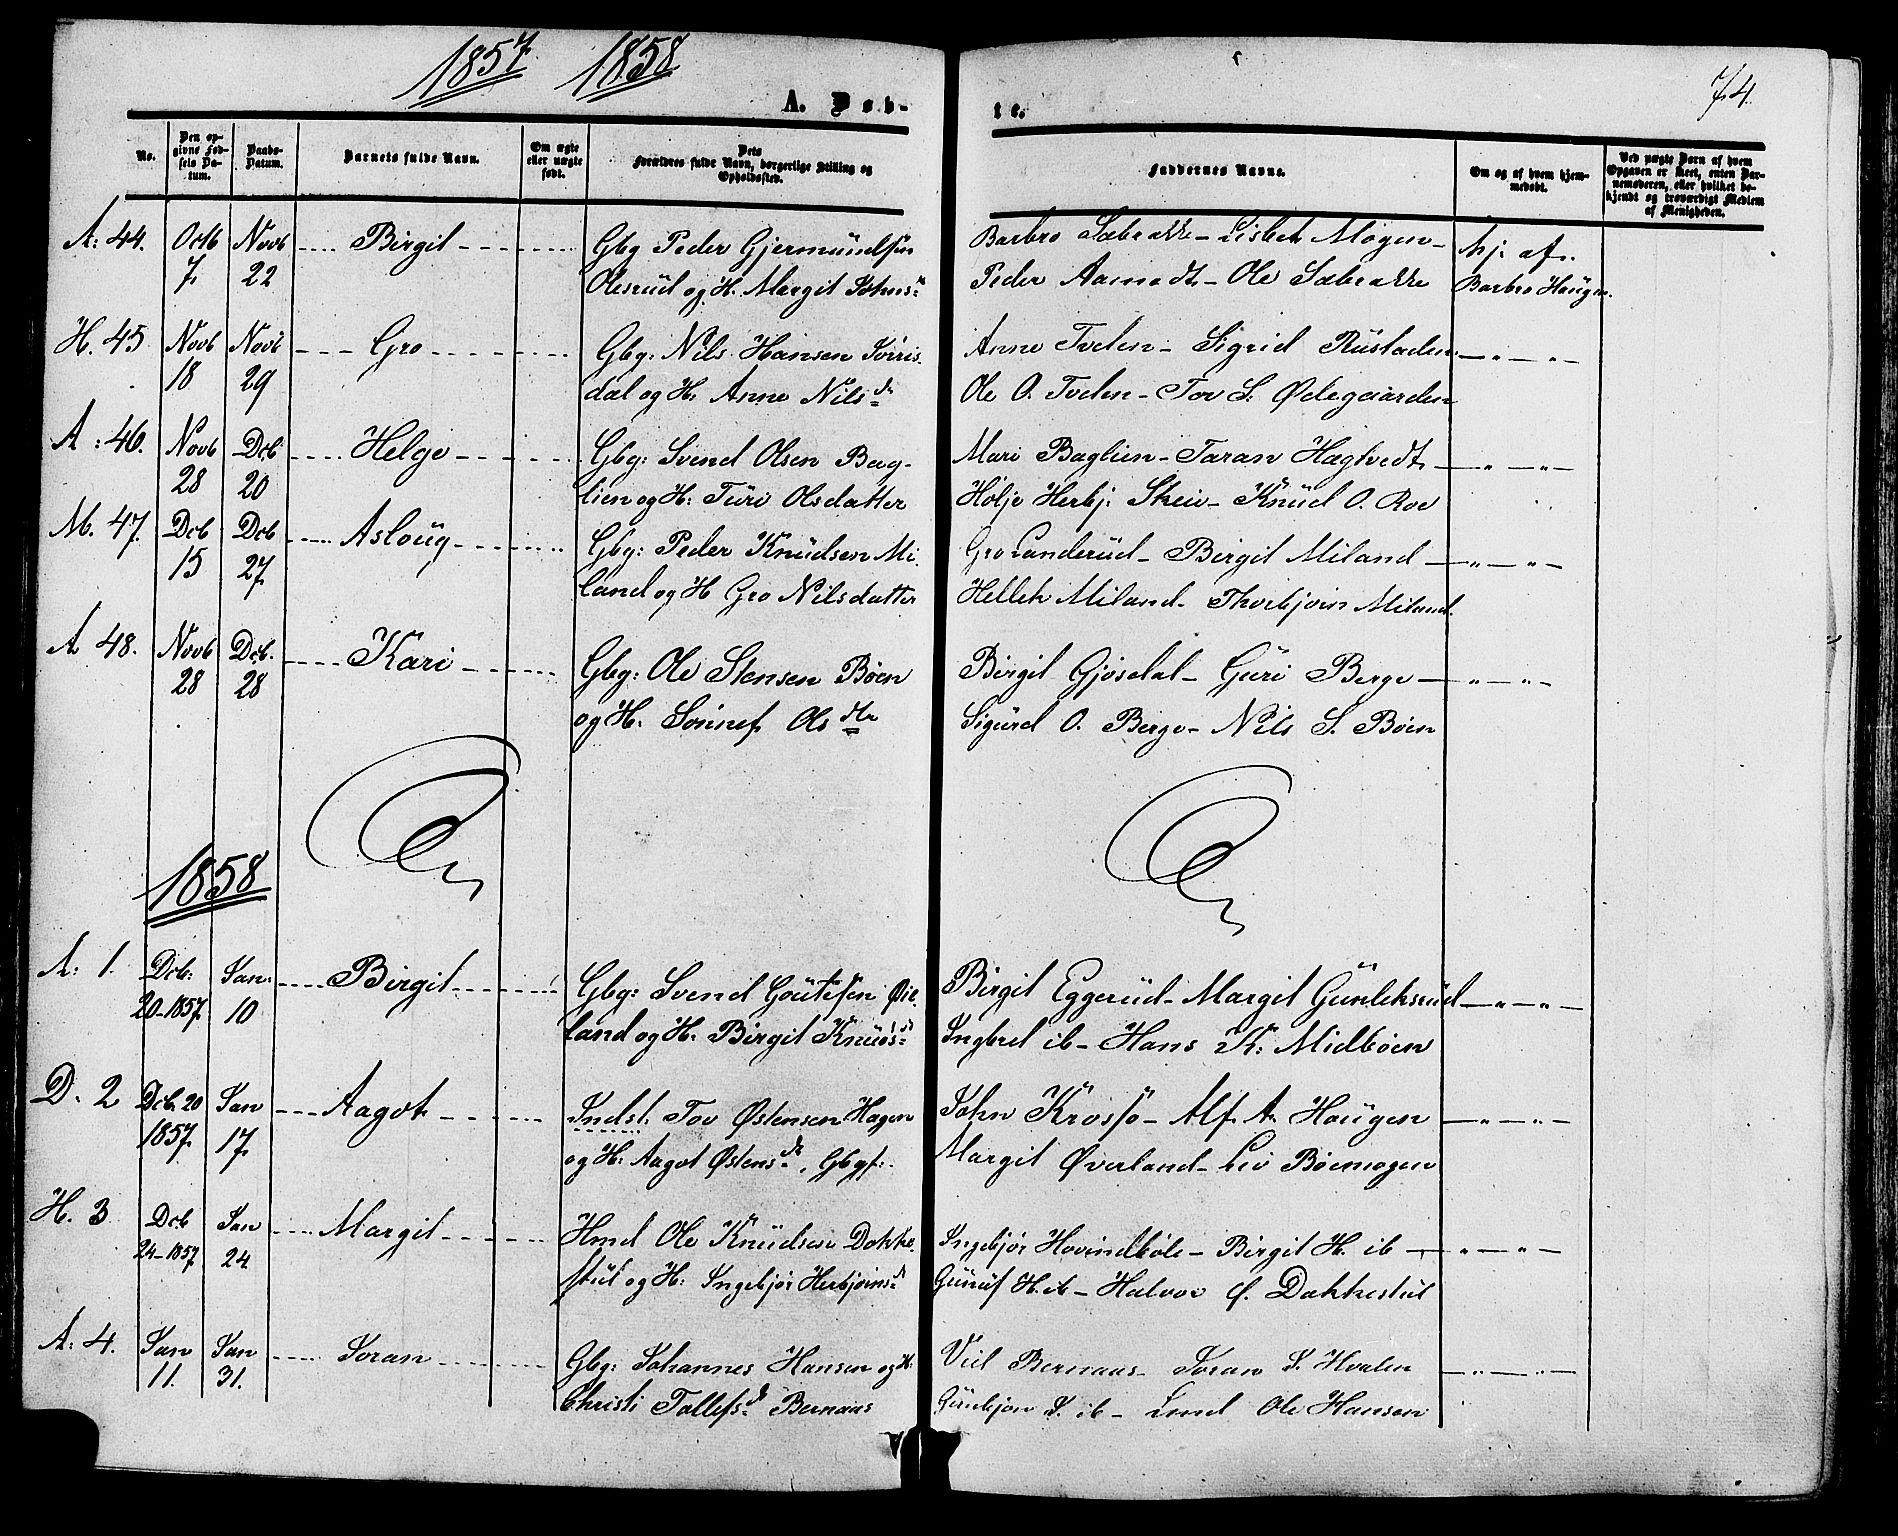 SAKO, Tinn kirkebøker, F/Fa/L0006: Ministerialbok nr. I 6, 1857-1878, s. 74